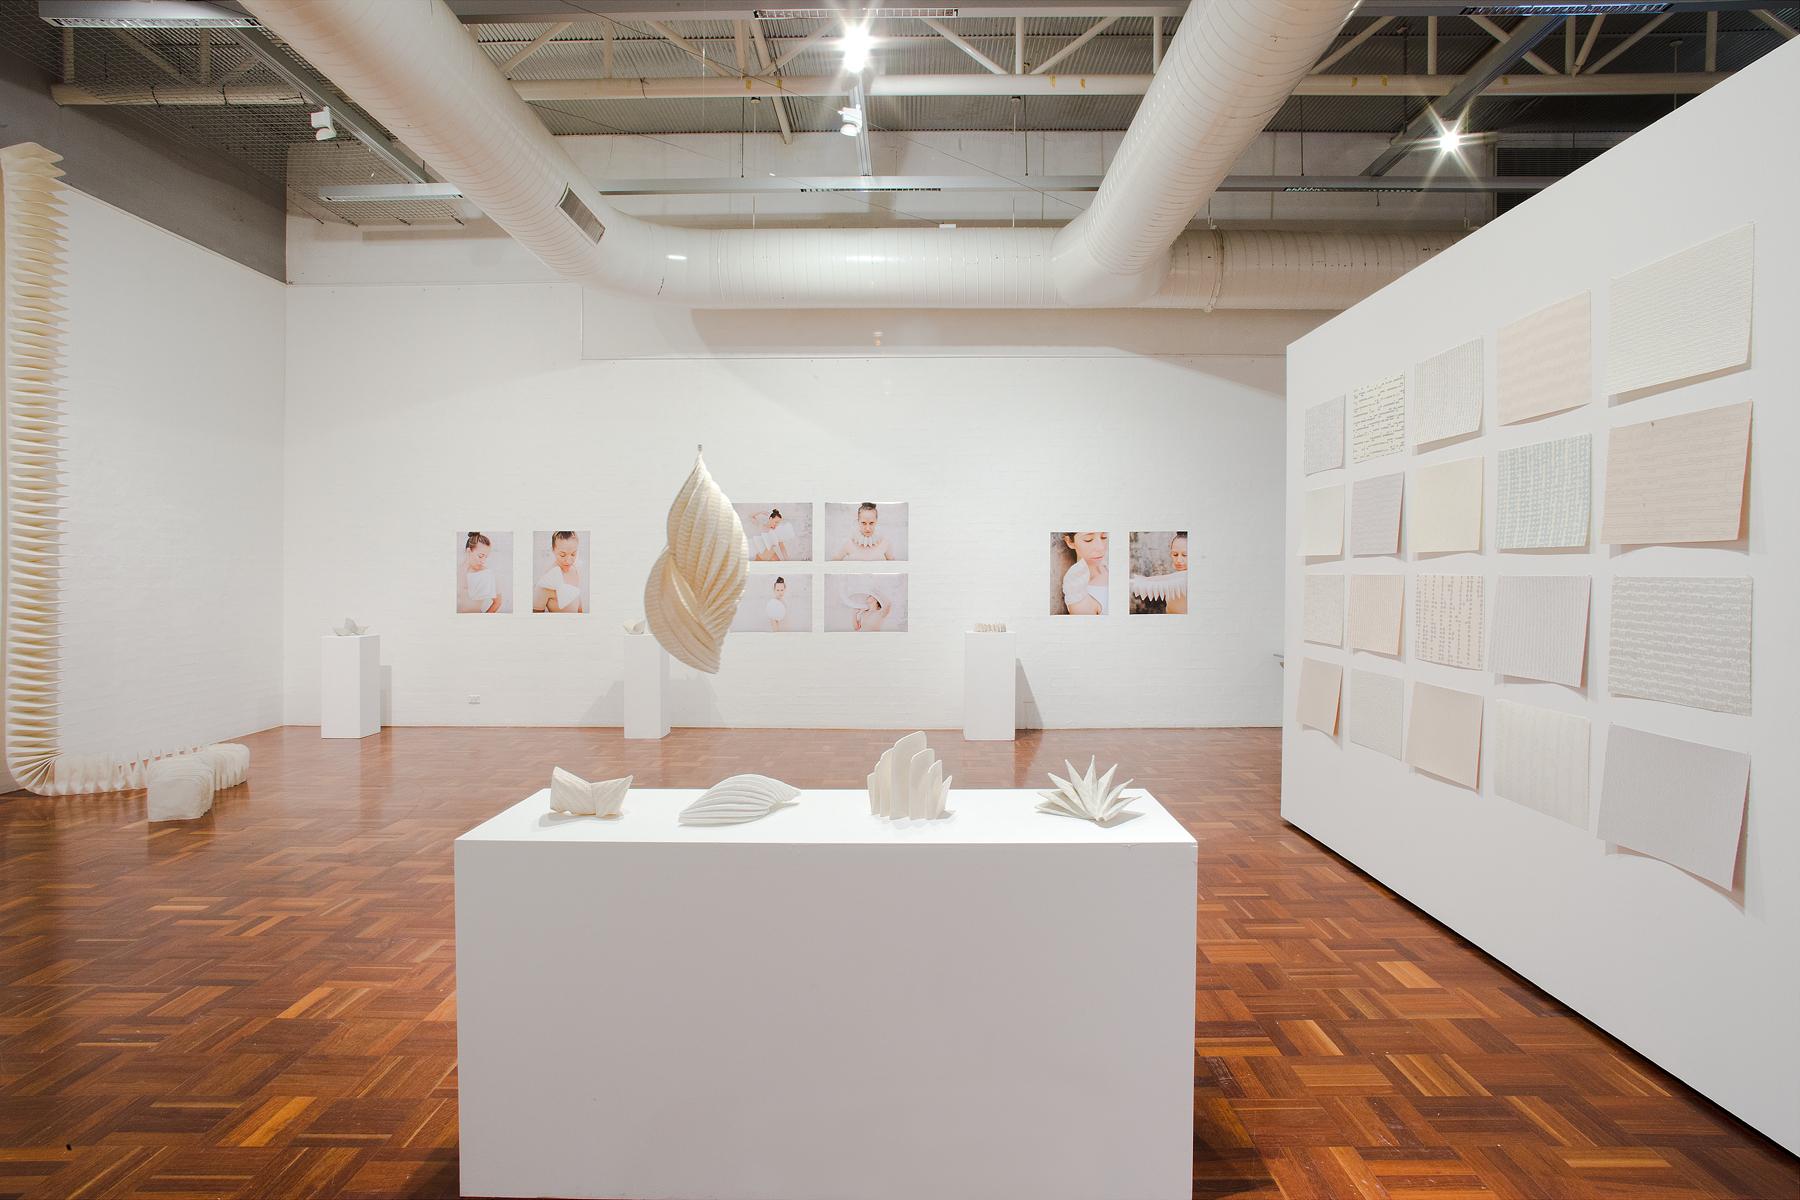 Jemima Parker, Installation of Honours work, 2012 Photo: Stuart Hay, ANU Photography